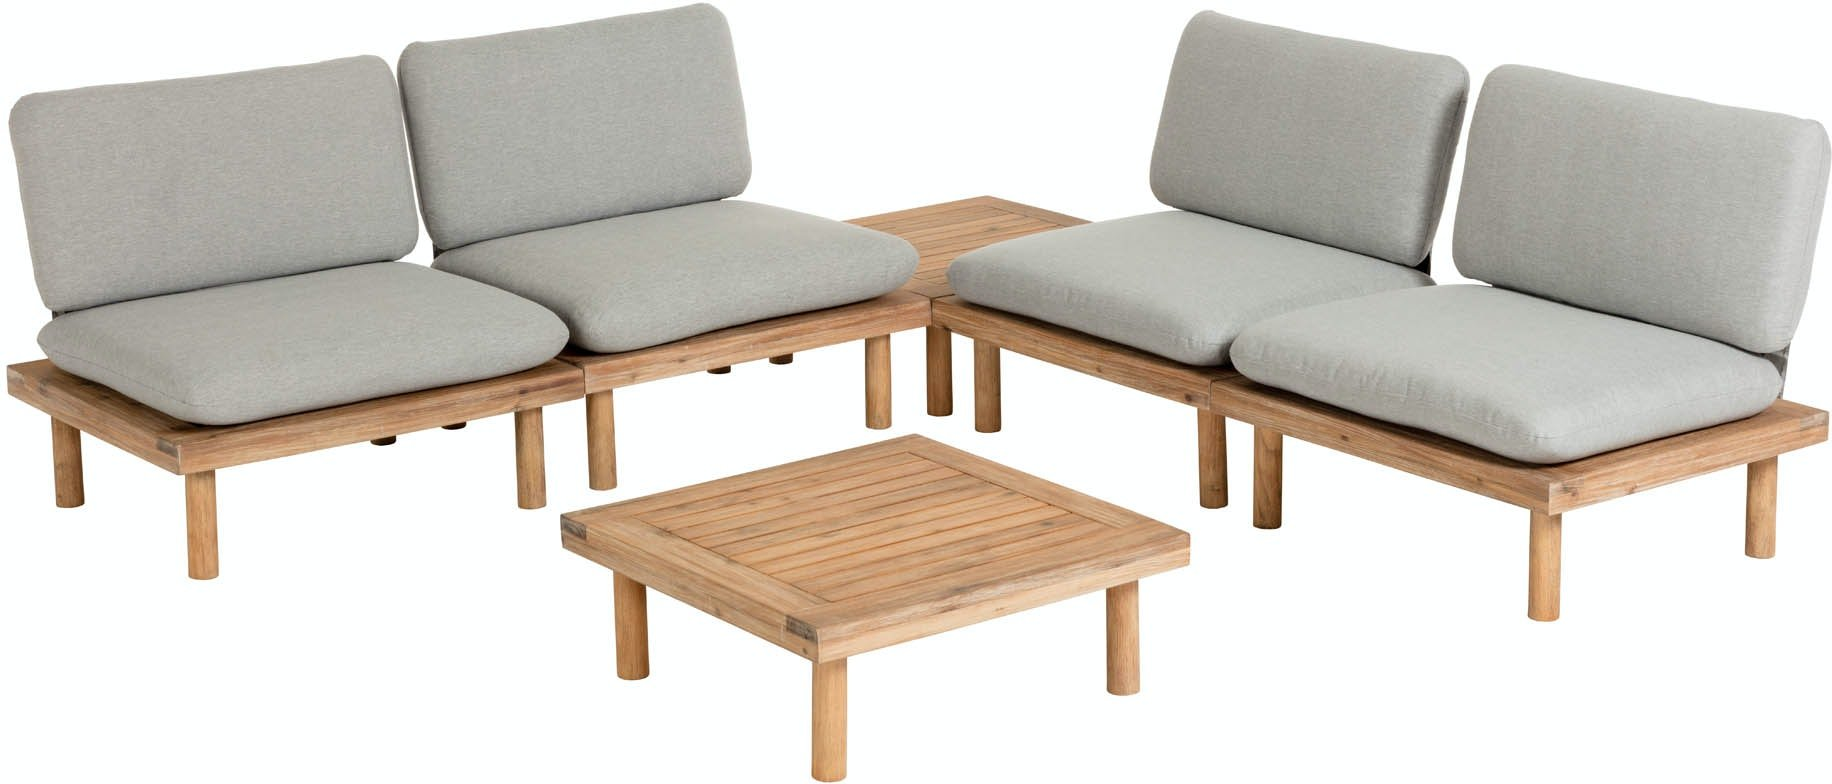 Køb Viridis, Udendørs loungesæt by LaForma (4 prs. + sofabord + sidebord, Grå/Natur)